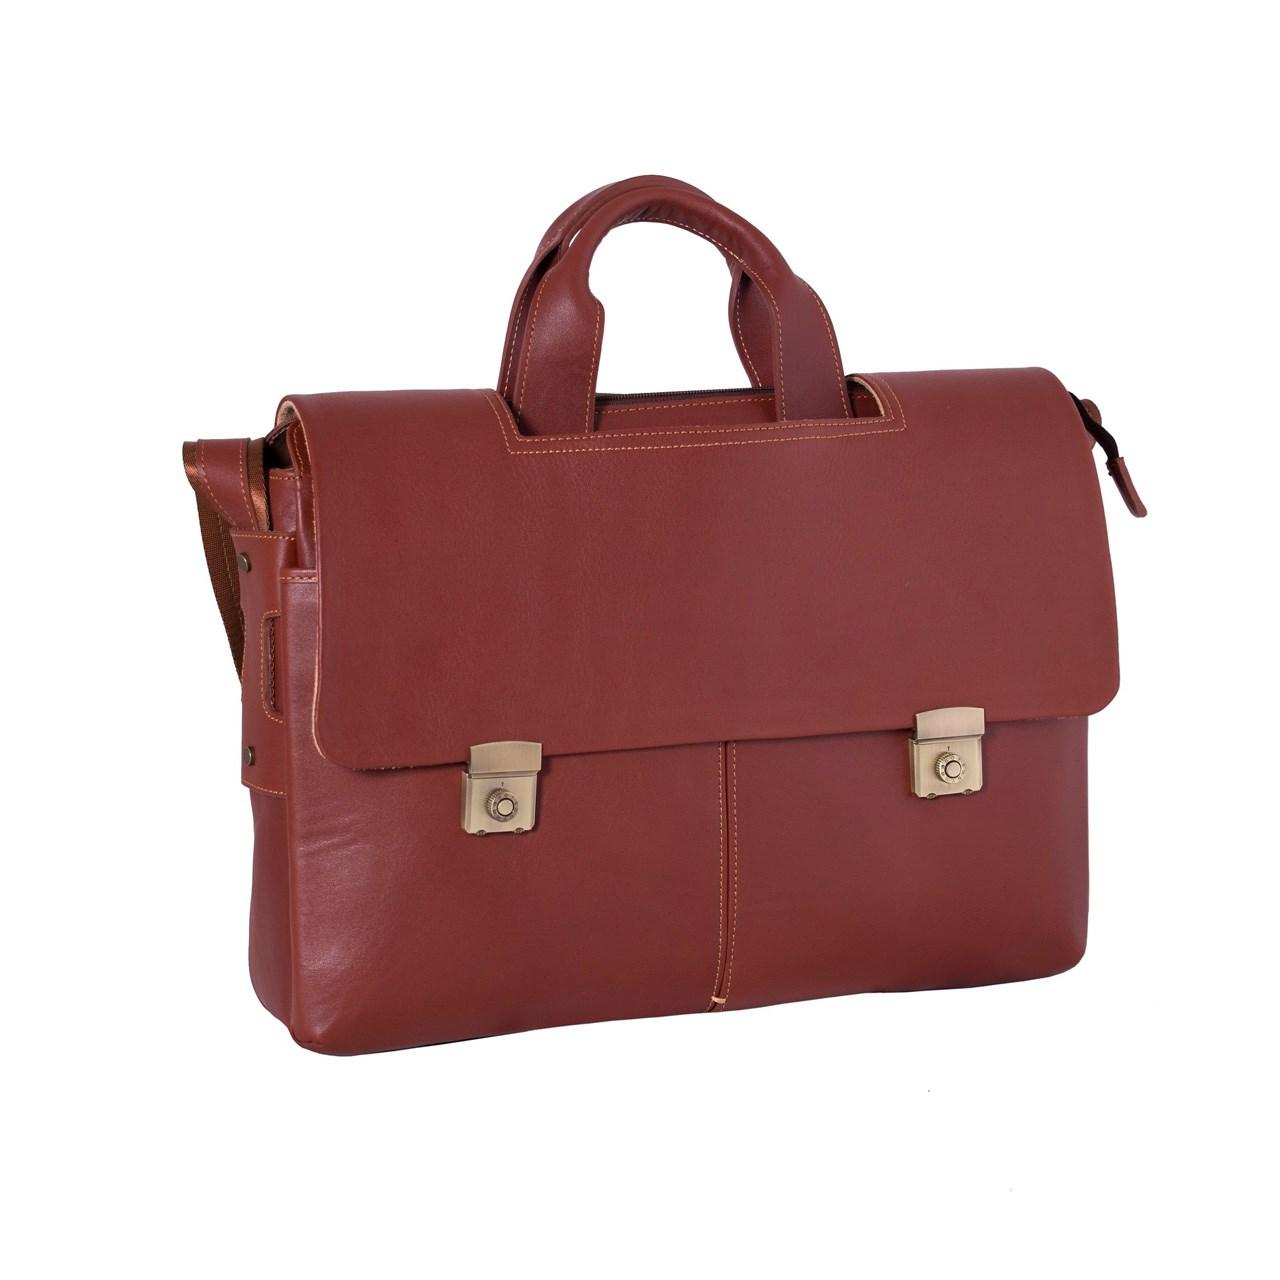 کیف اداری چرم طبیعی آدین چرم مدل DL42